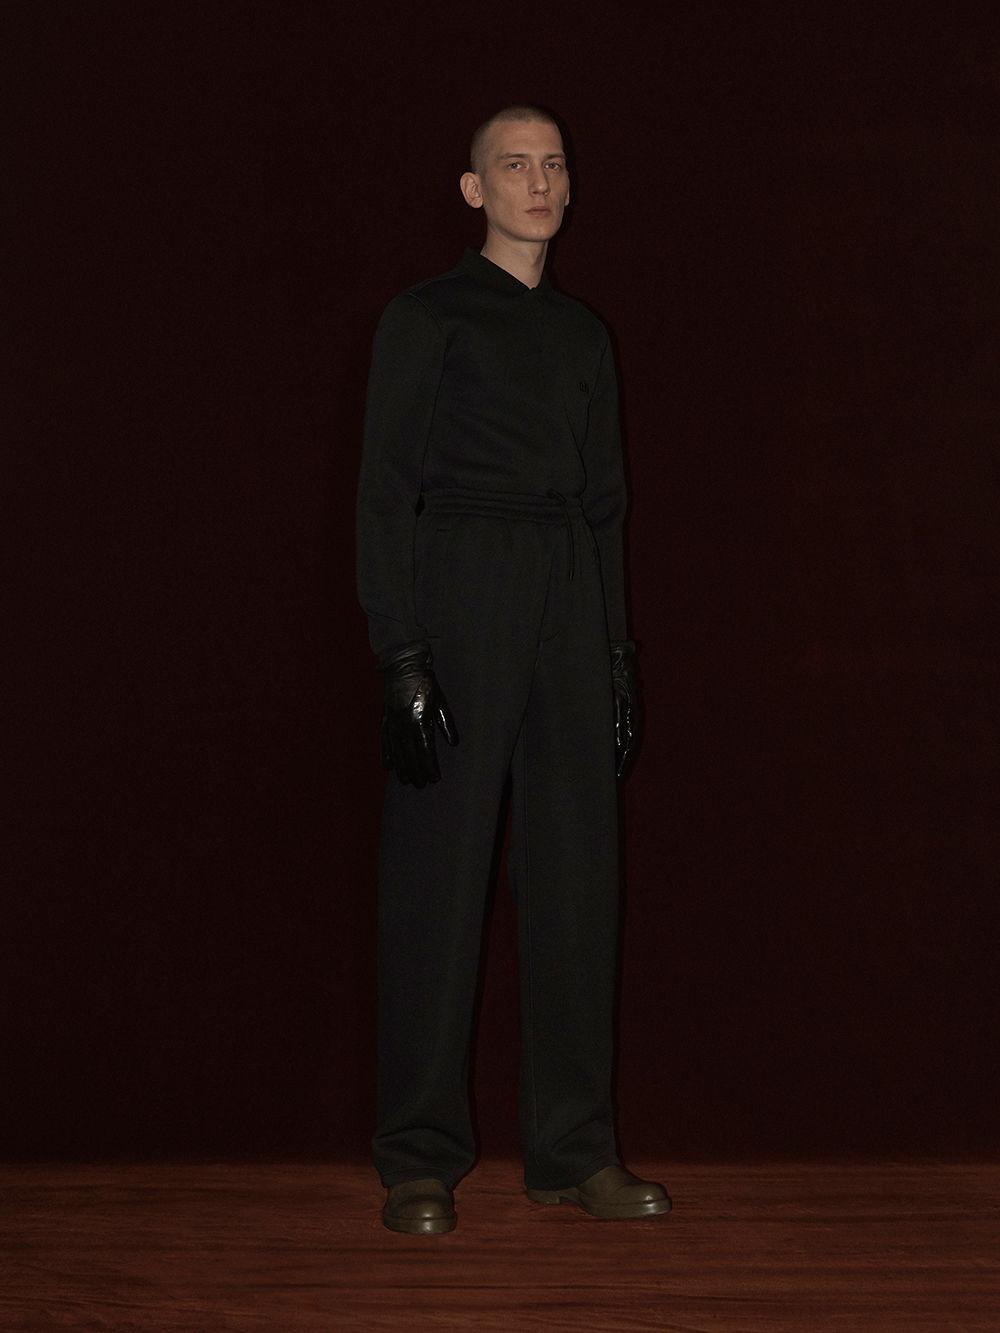 belenciaga-menswear-automne-hiver-2016-2017